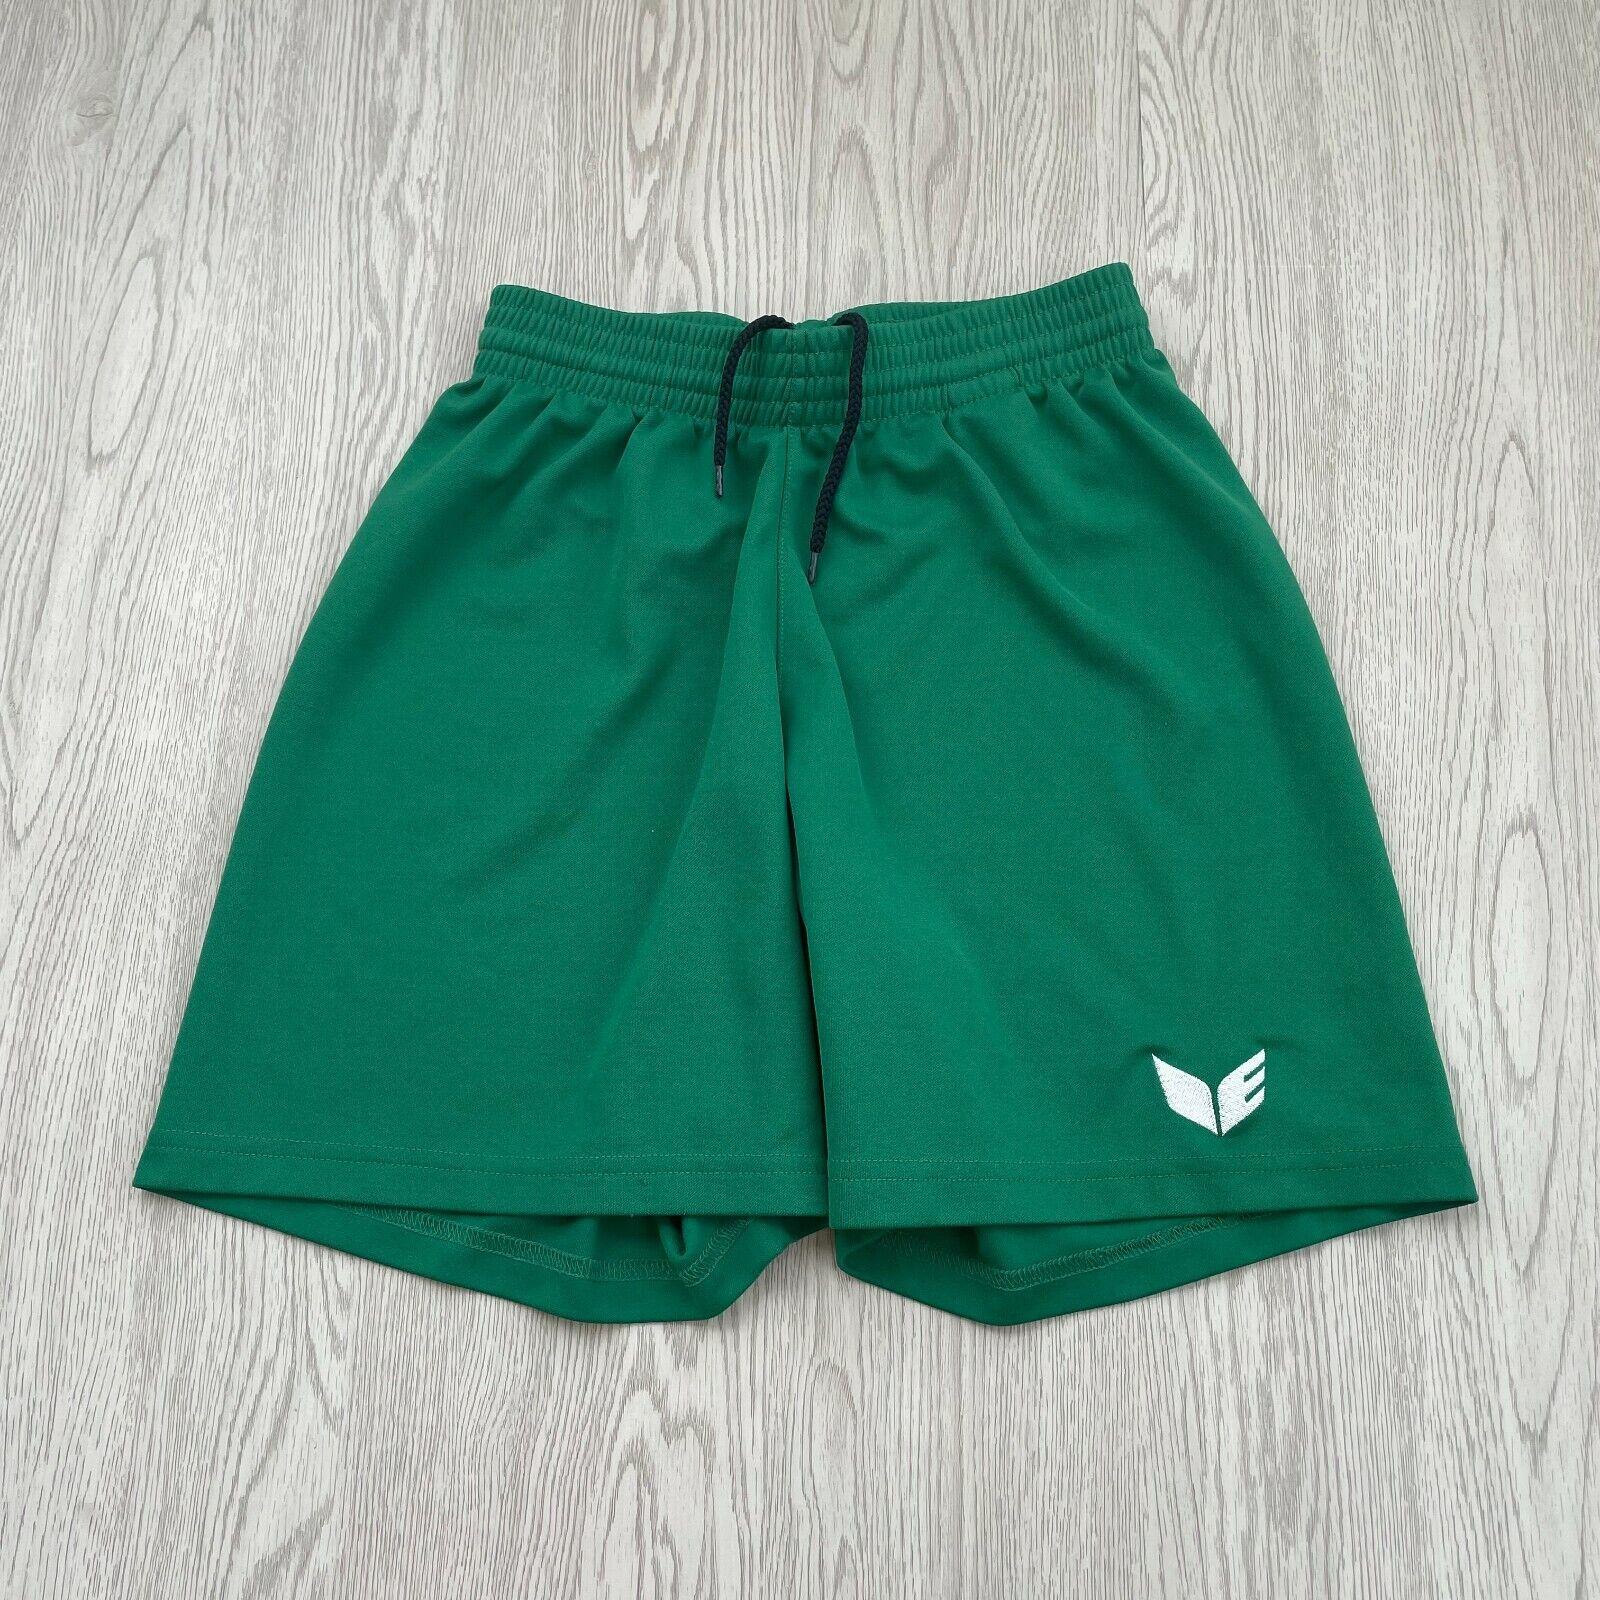 Erima Vintage Men's Sports Shorts - XS - Running Training Gym - Green